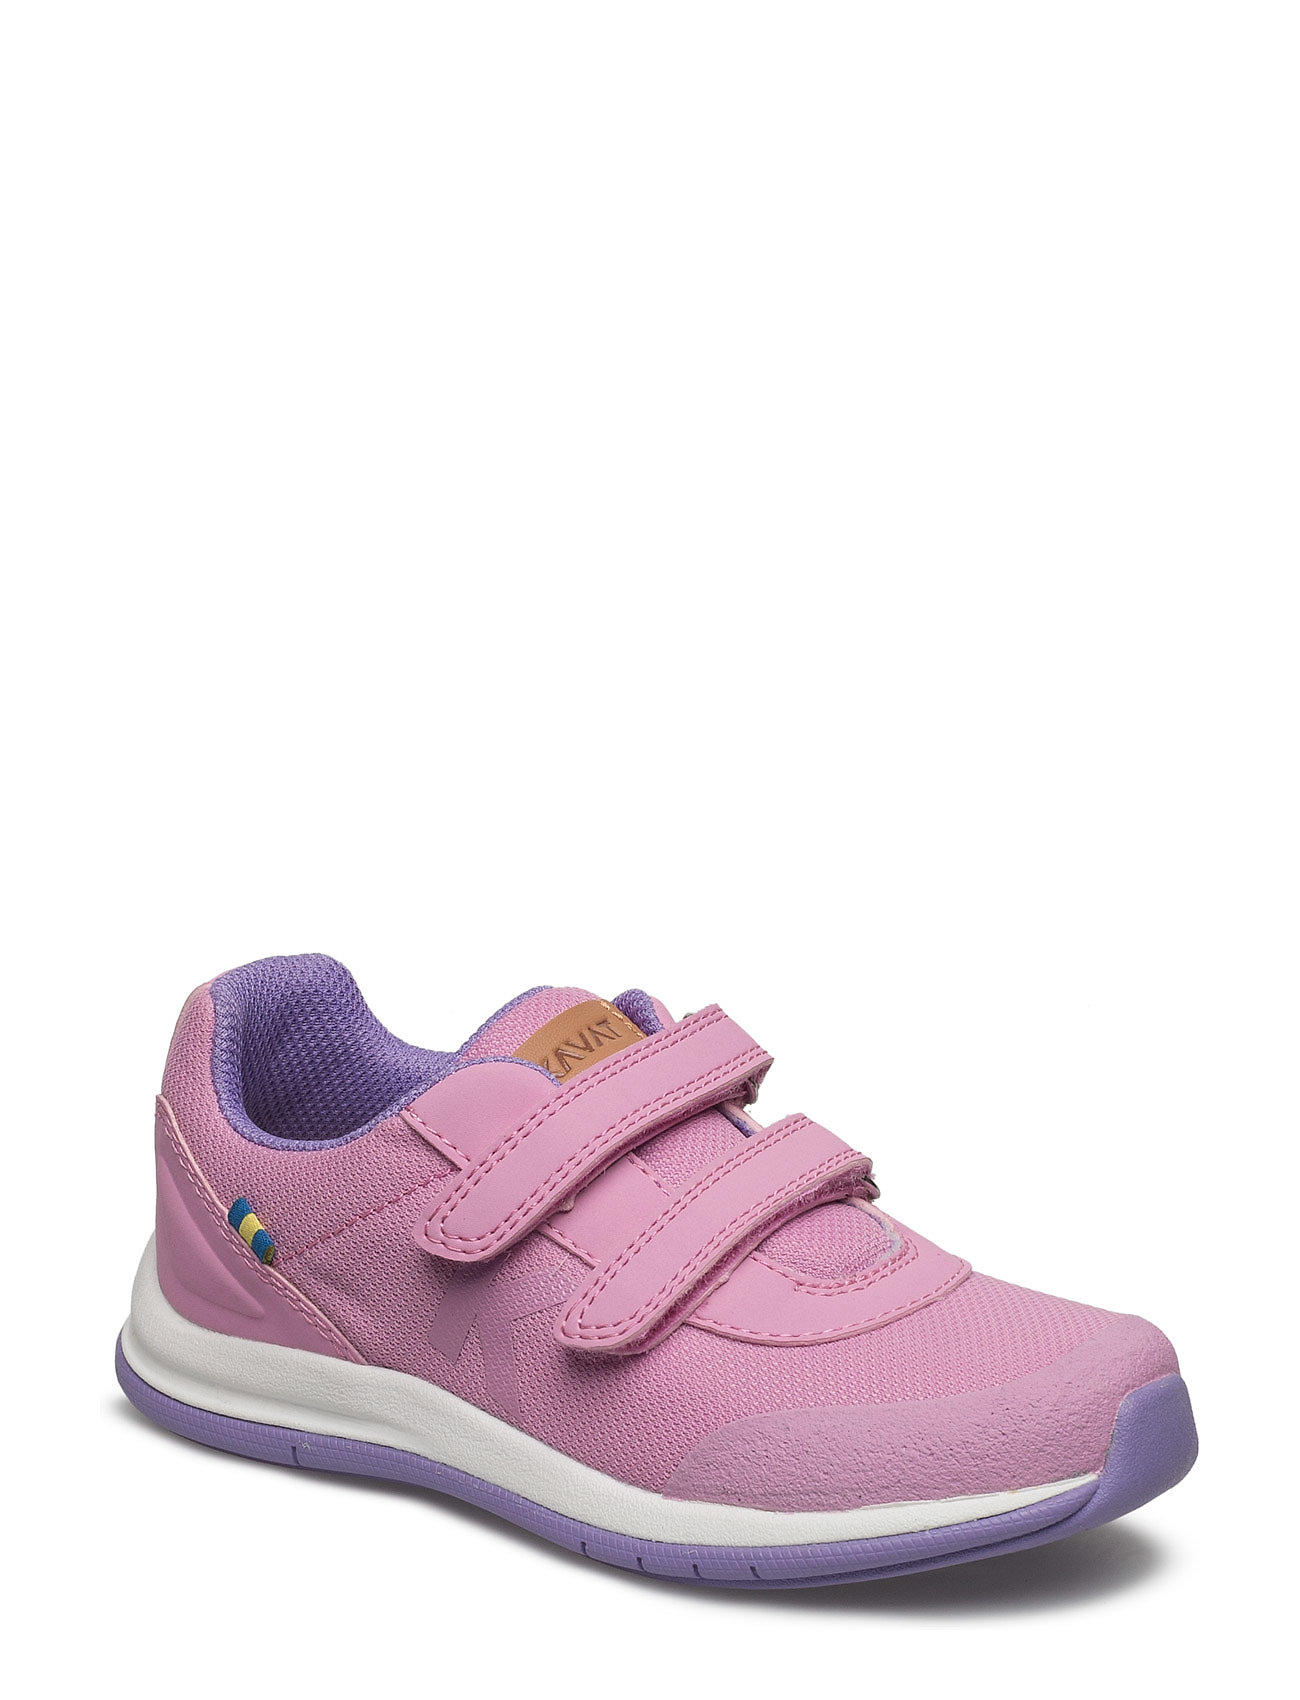 NäRke Sneaker Kavat Sko & Sneakers til Børn i